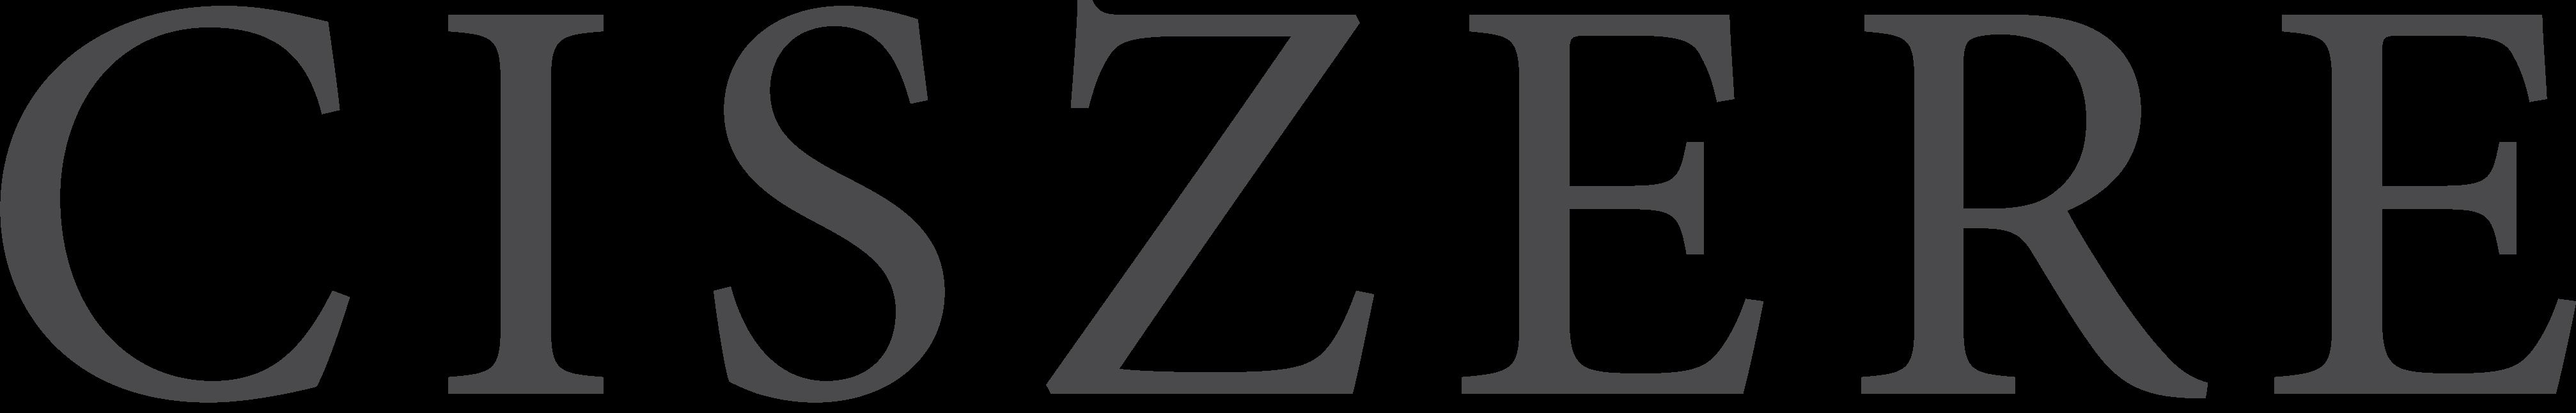 Ciszere logo